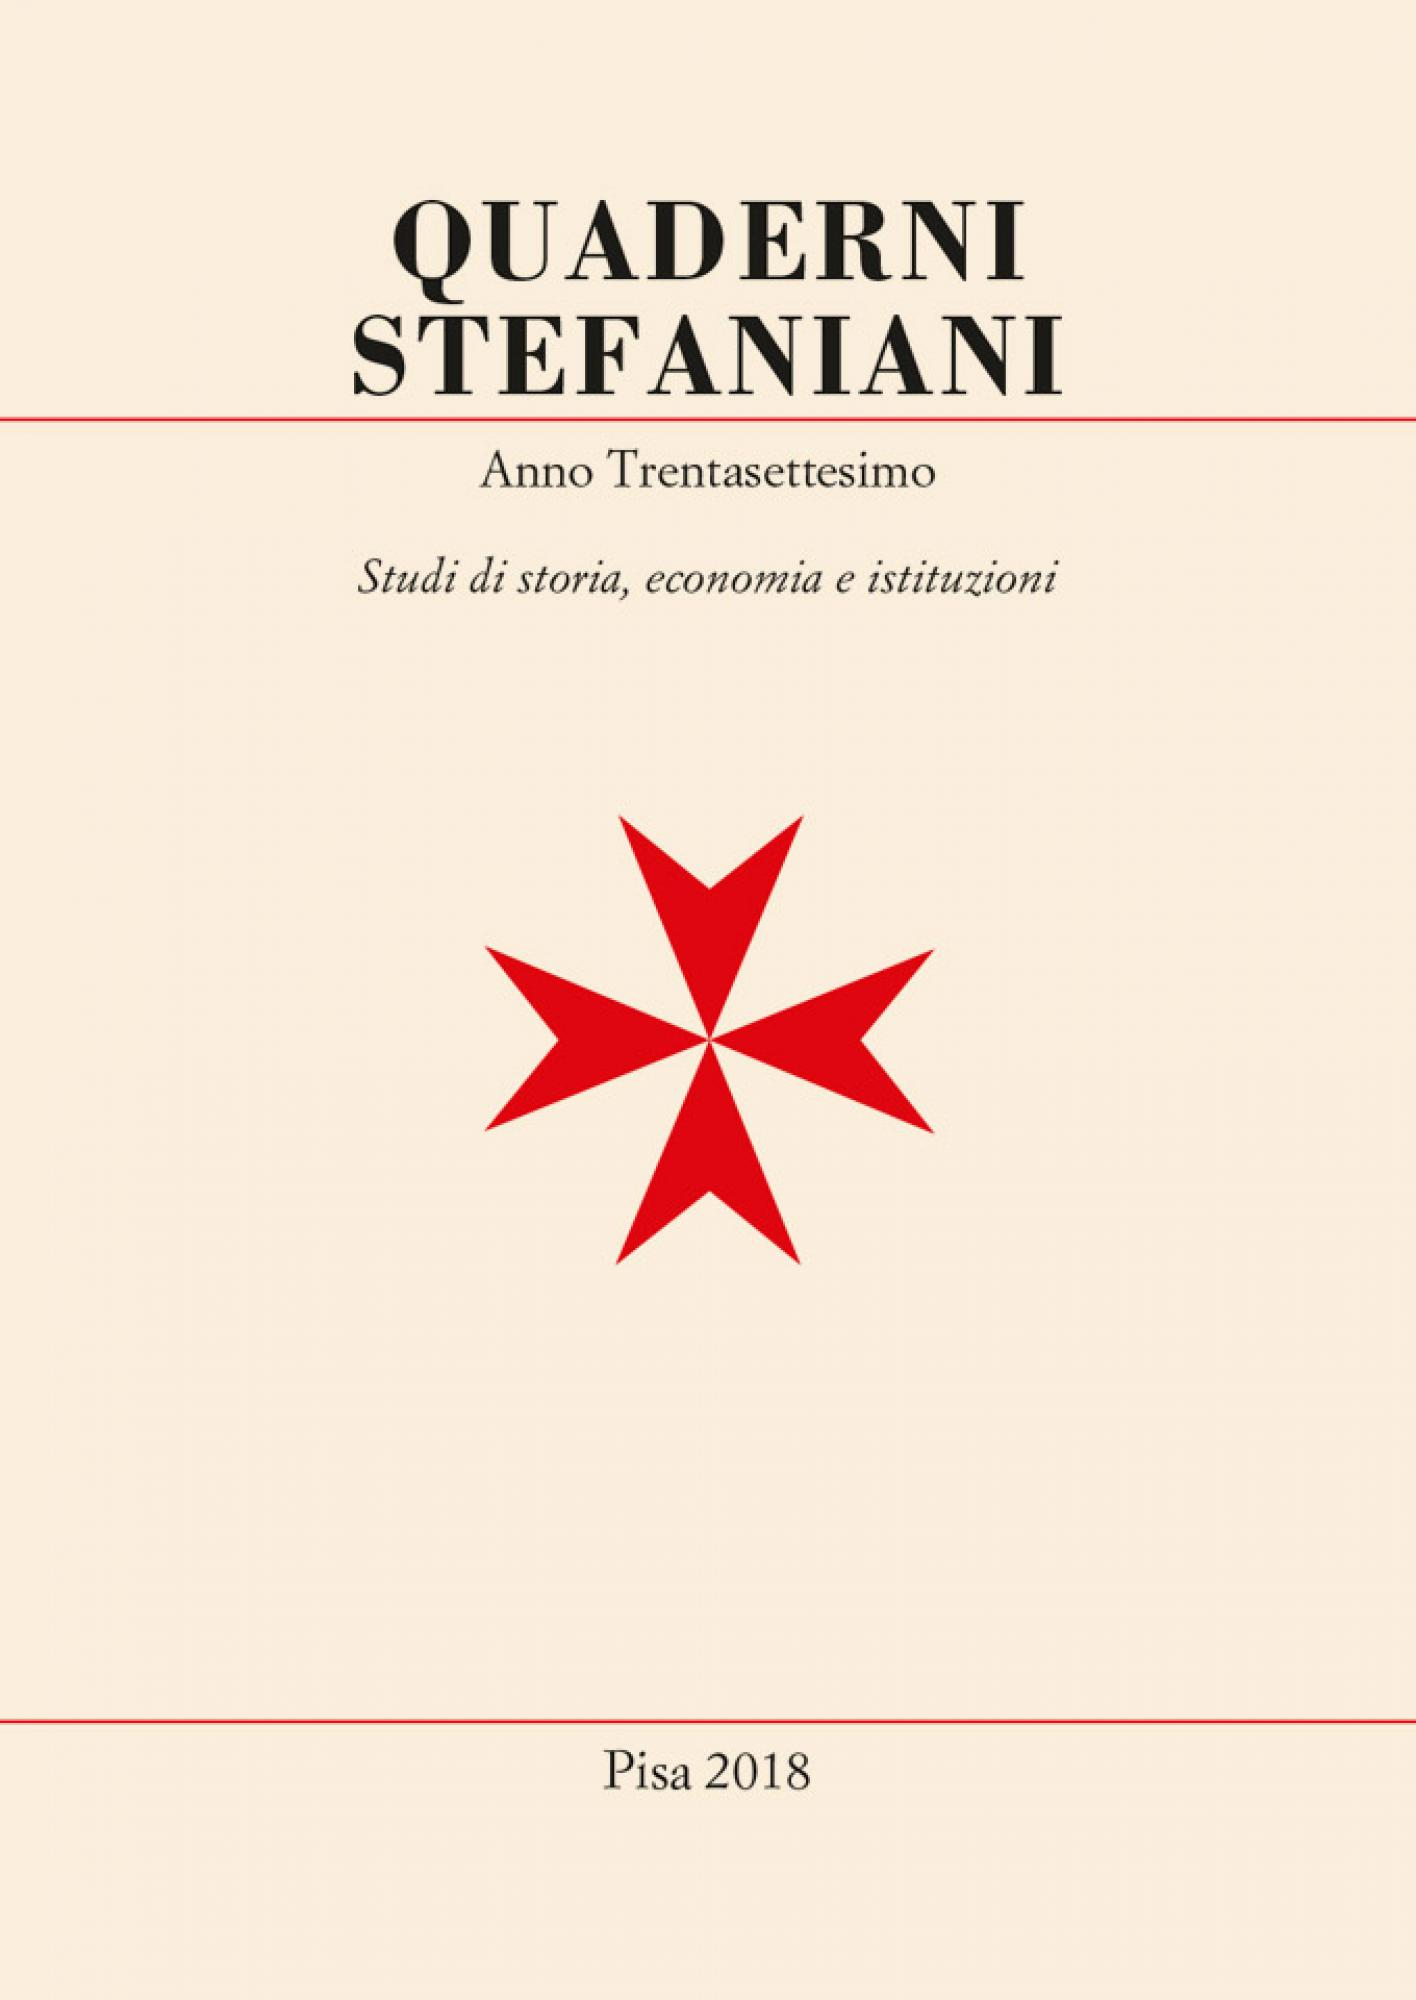 Quaderni stefaniani.anno trentasettesimo